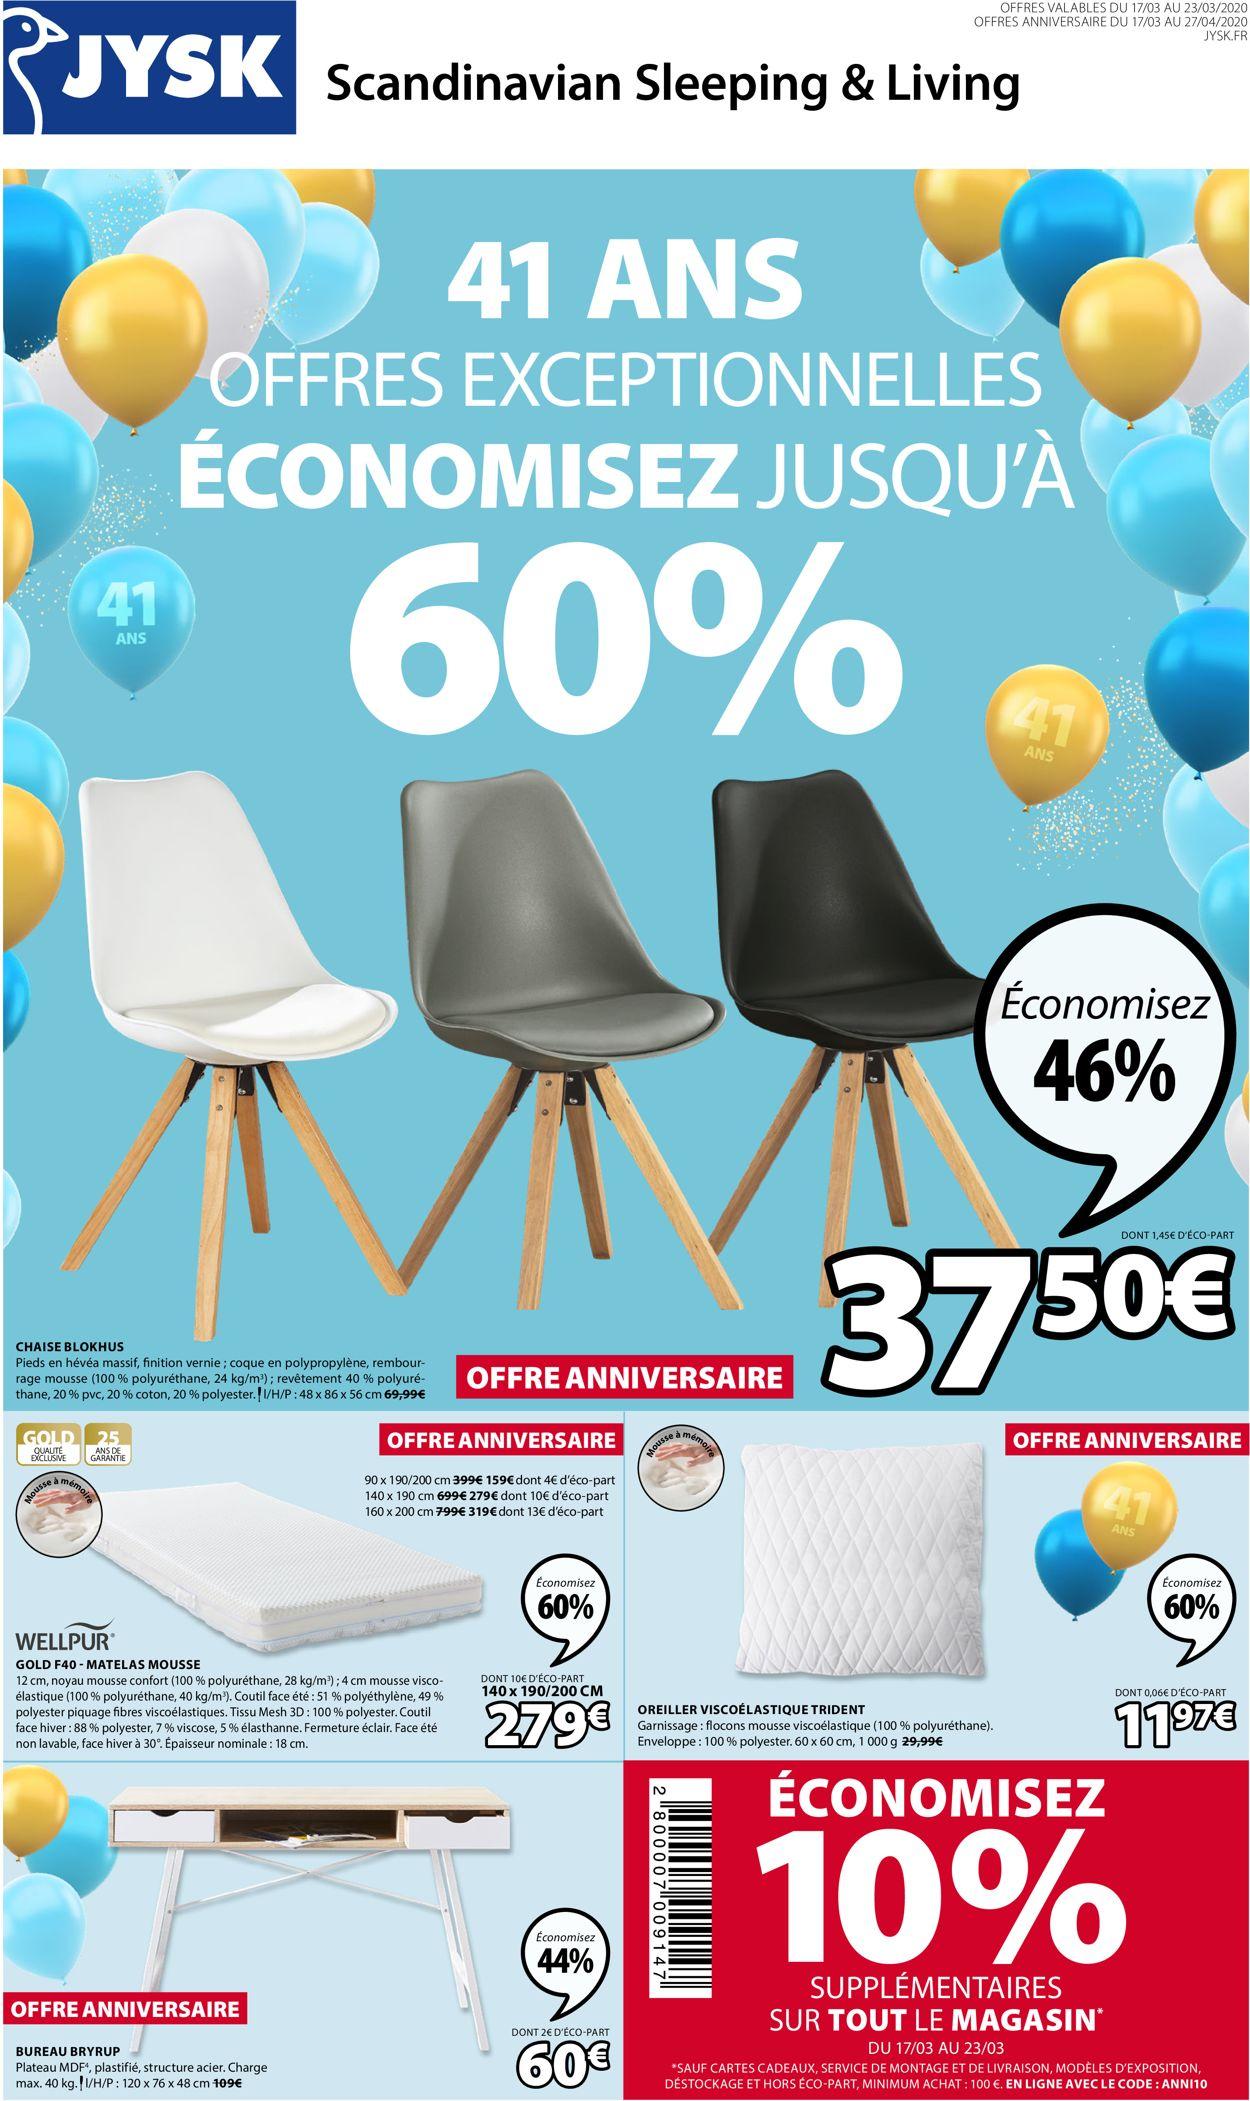 JYSK Catalogue - 17.03-27.04.2020